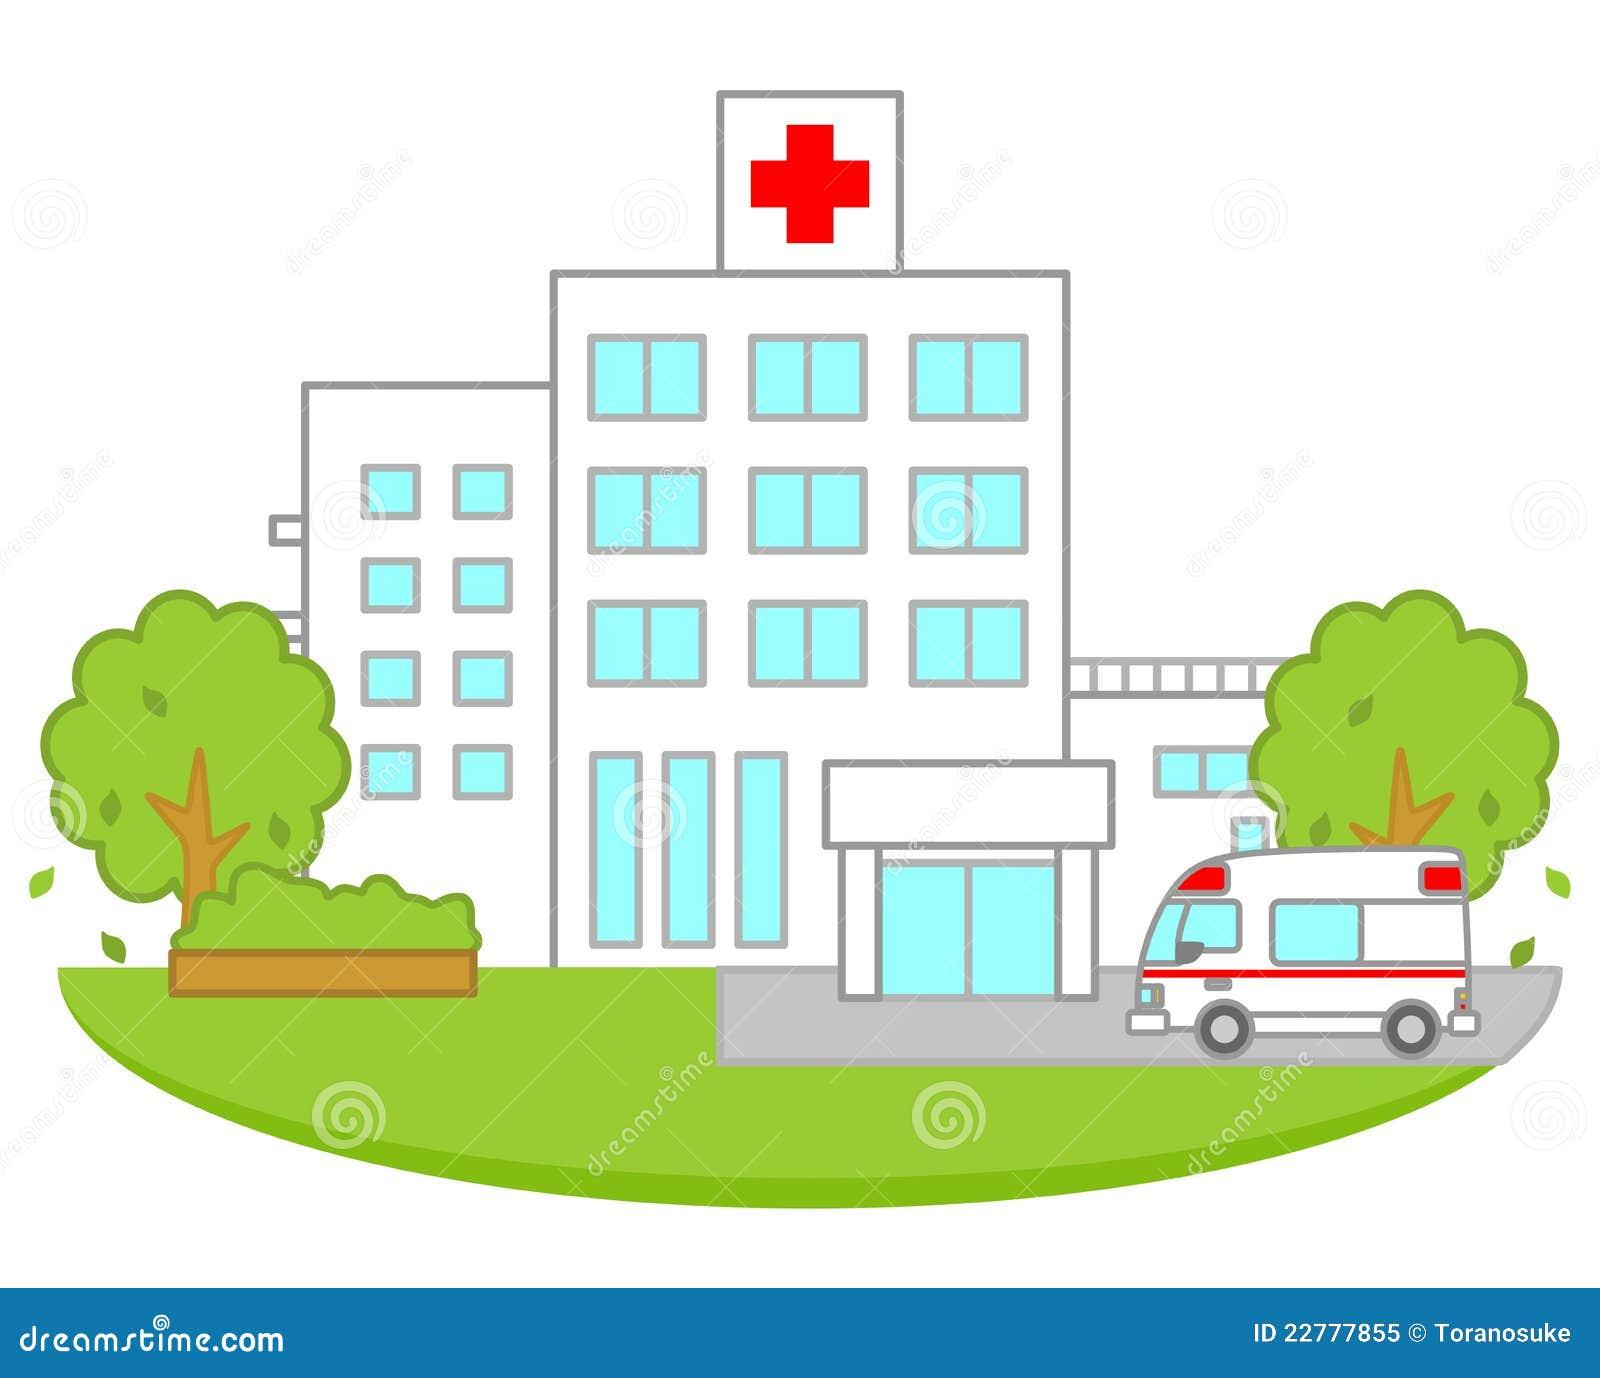 hospital royalty free stock photo image 22777855 Free Clip Art Borders for Word Free Wedding Borders Clip Art